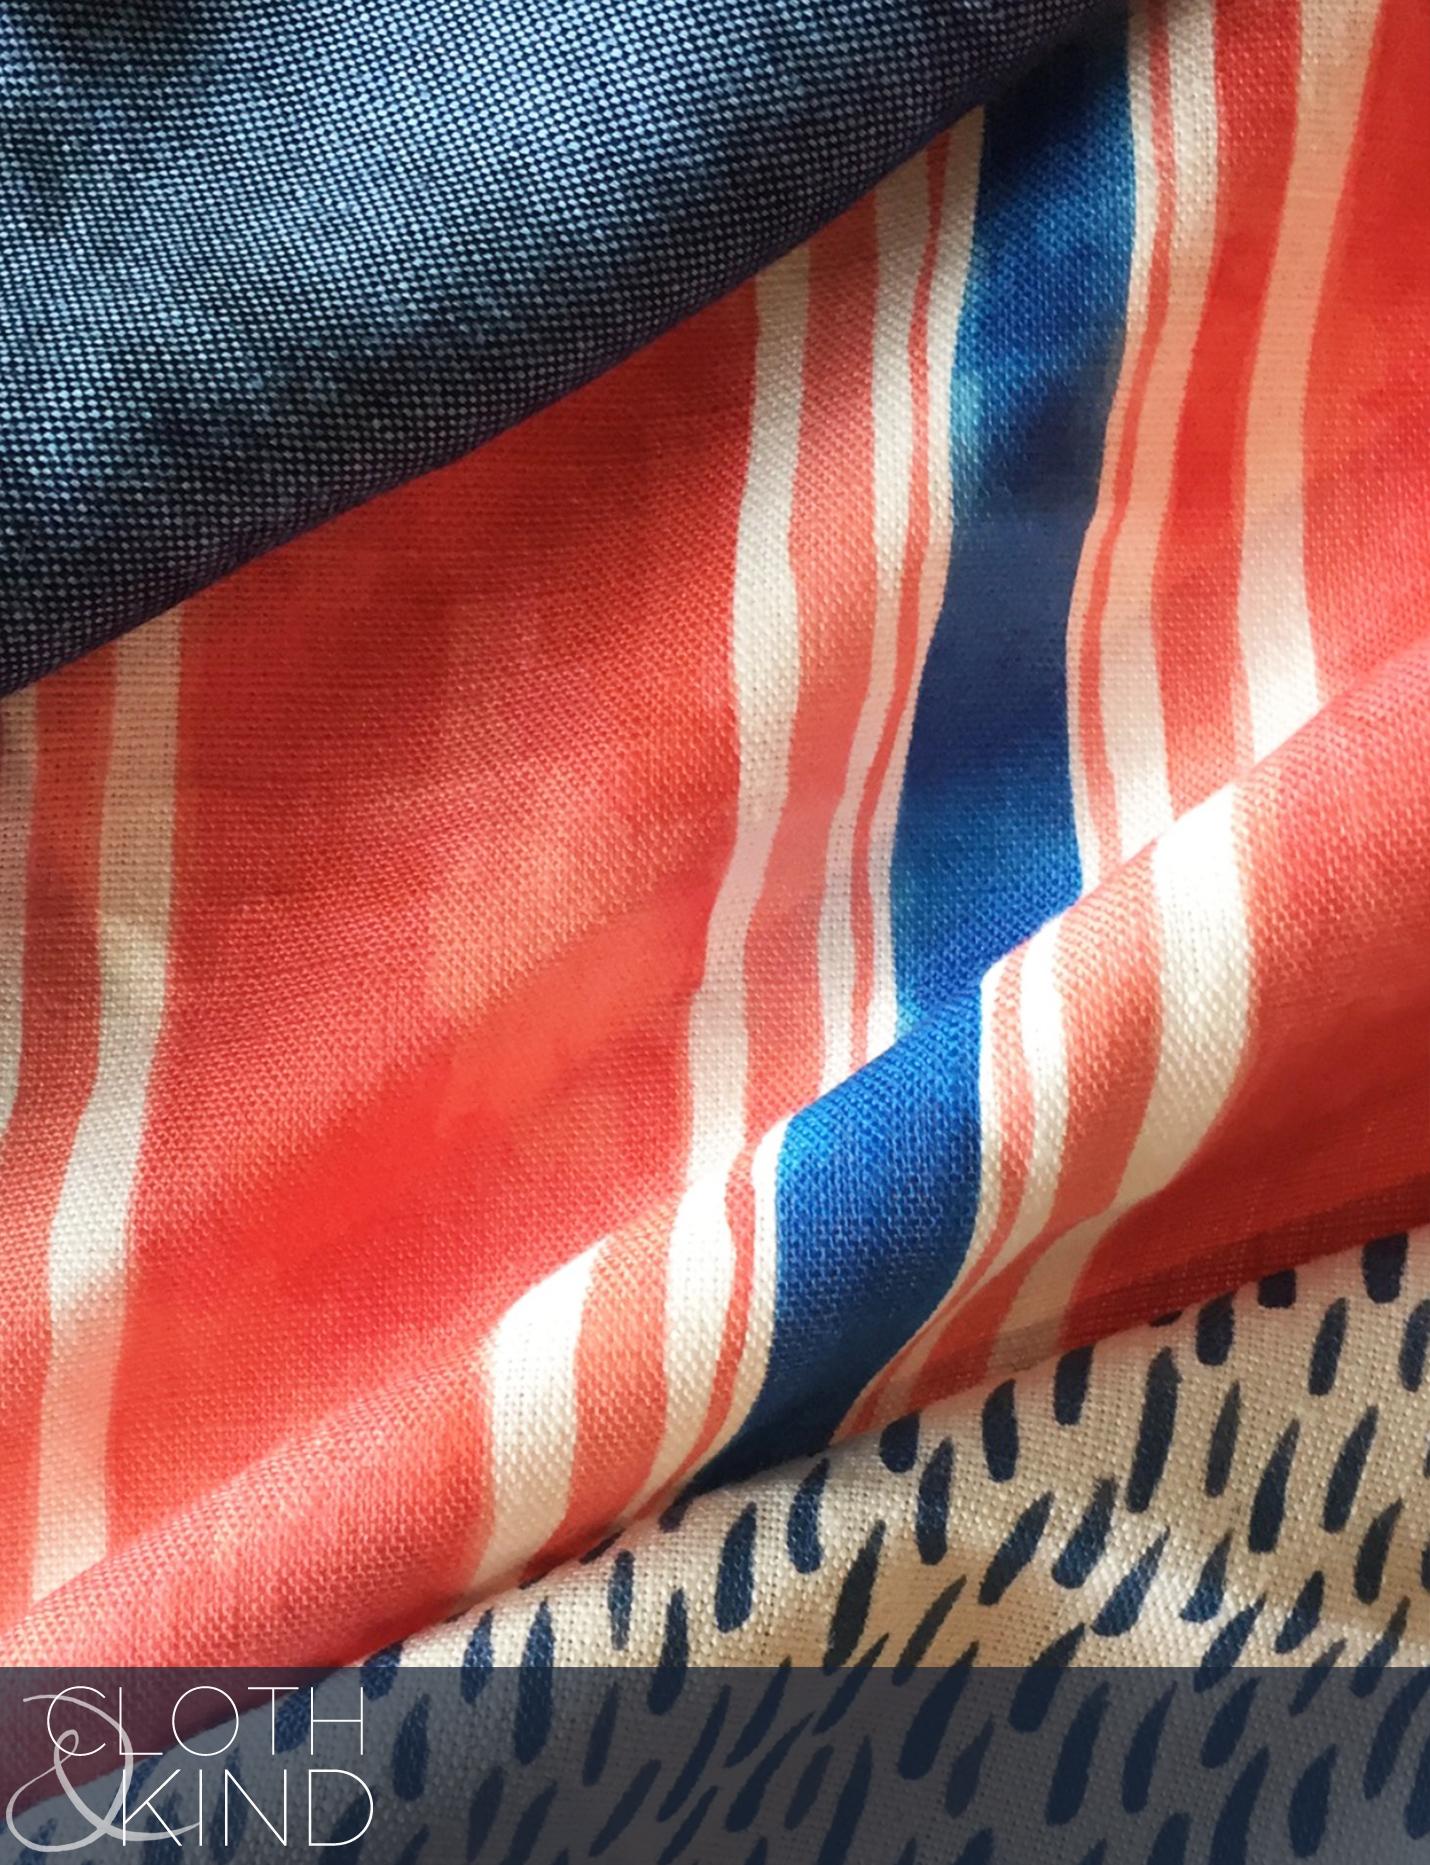 CLOTH & KIND // Palette No. 68